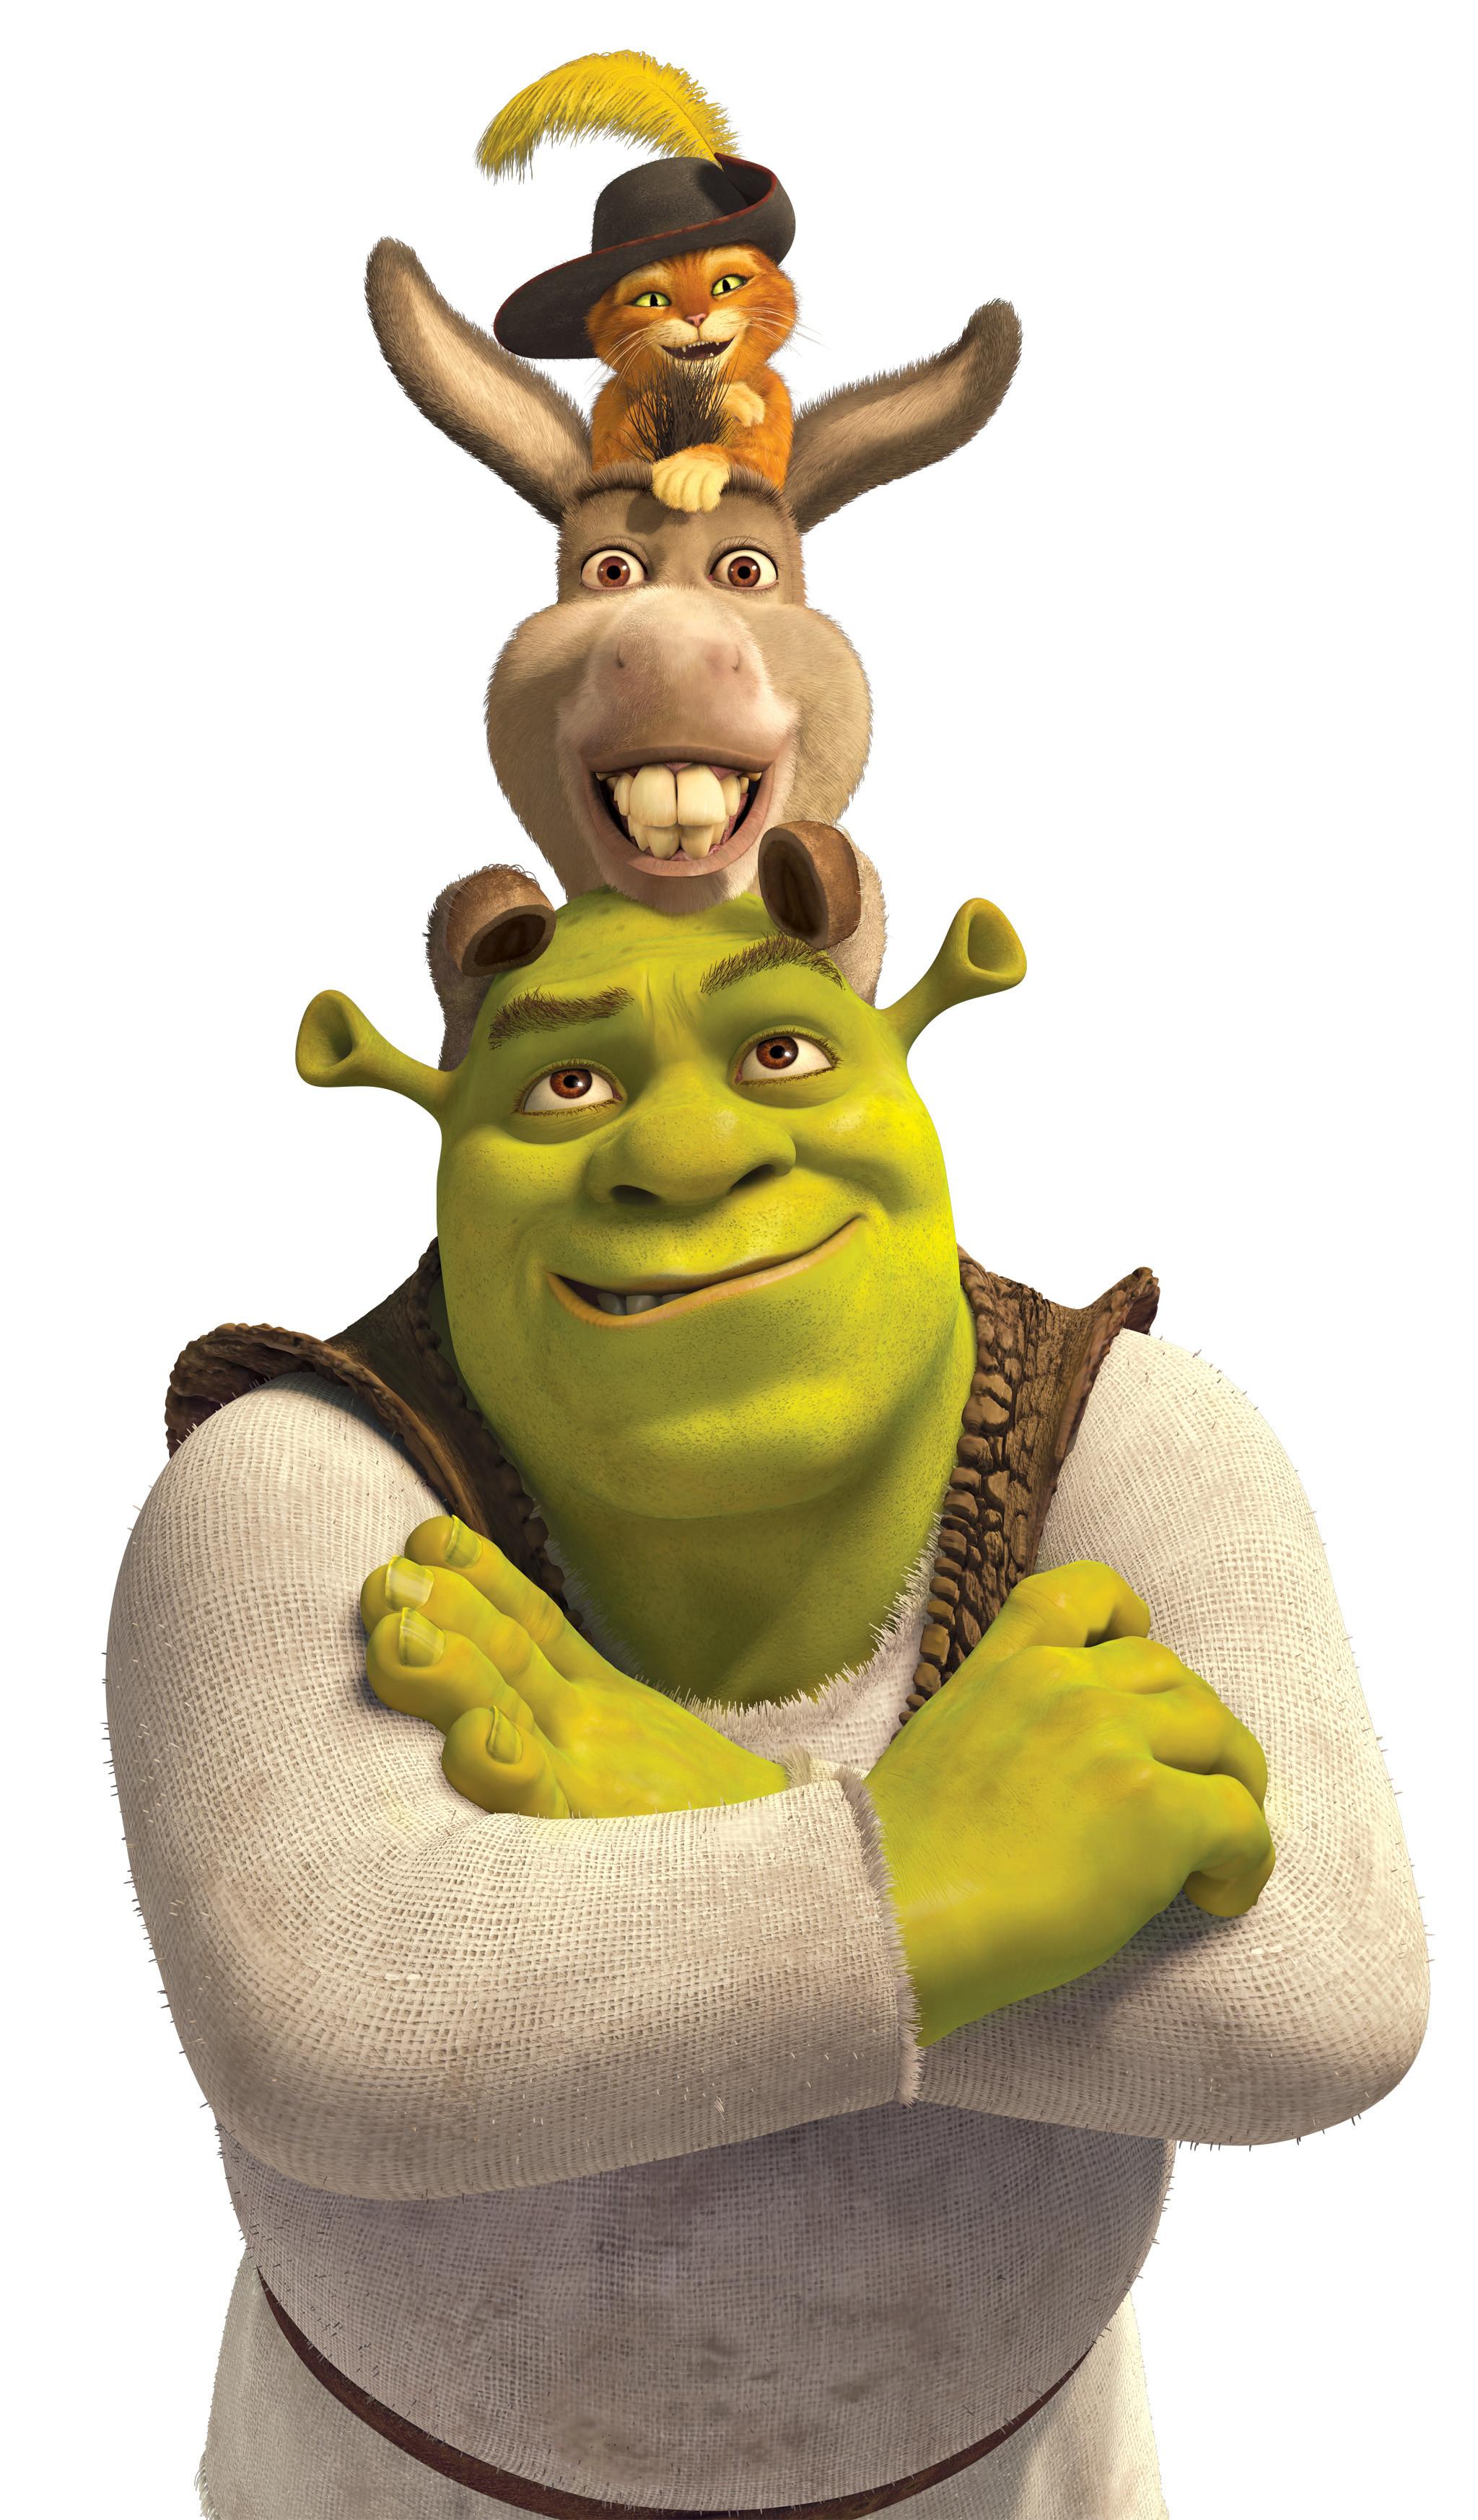 Download Shrek Cartoon Wallpaper For Widescreen, Fullscreen, High  Definition, Dual Monitors free of cost from epeper. | HD Wallpapers |  Pinterest | Cartoon …